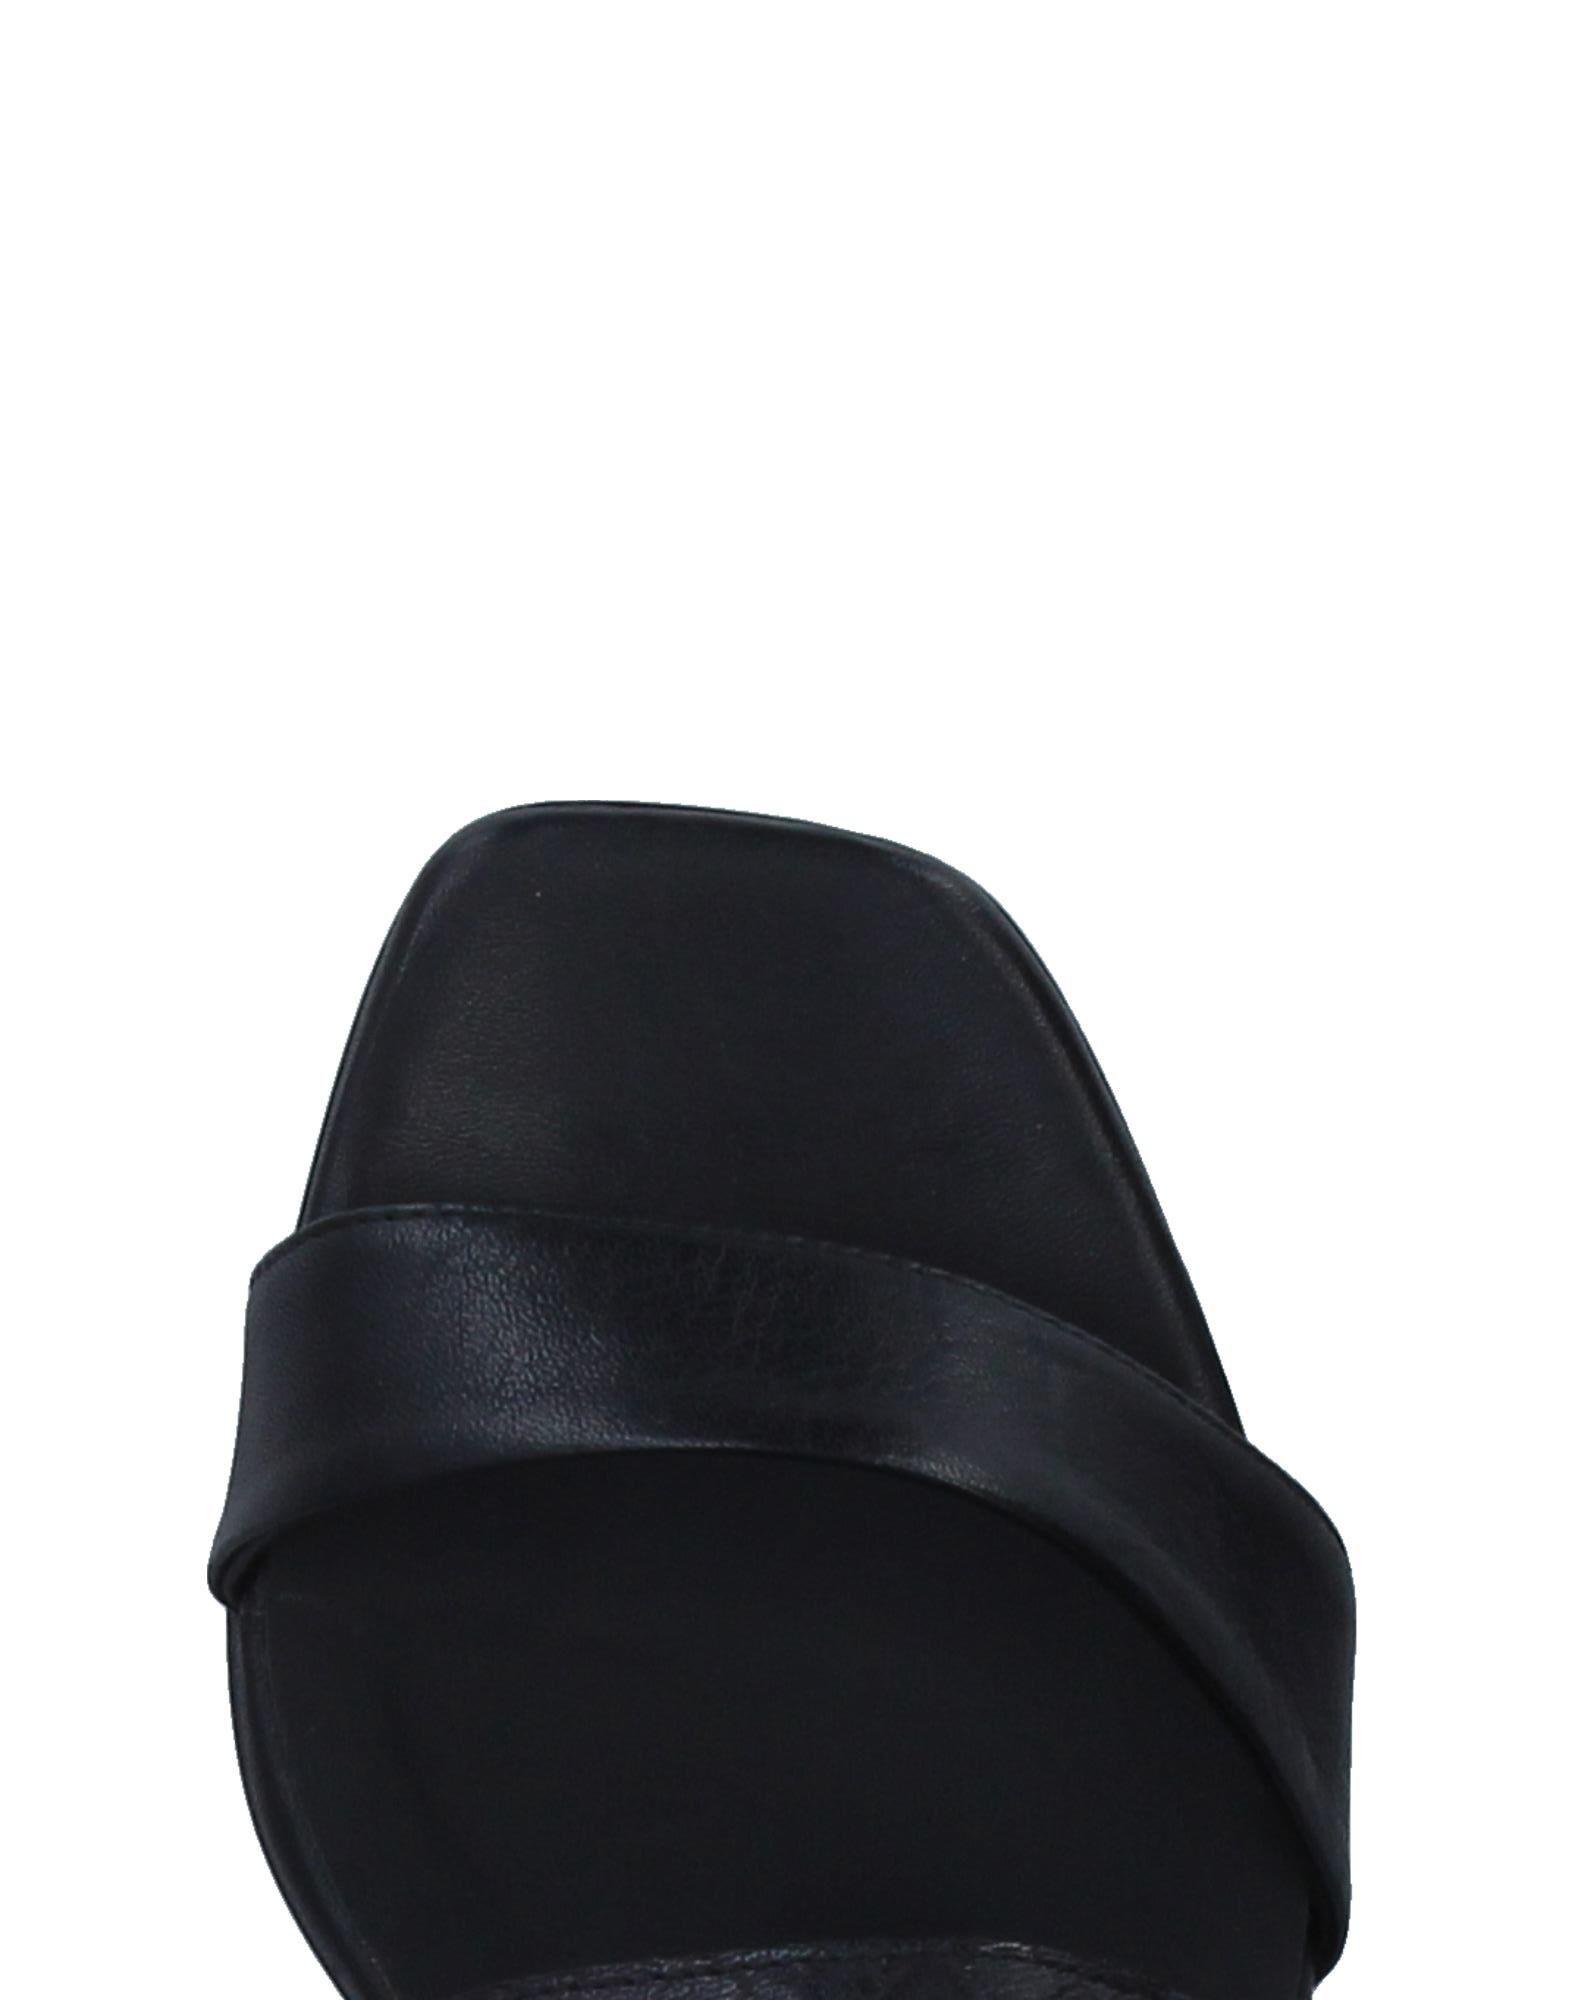 Sgn Giancarlo Paoli Schuhe Sandalen Damen  11336996CX Gute Qualität beliebte Schuhe Paoli 712632